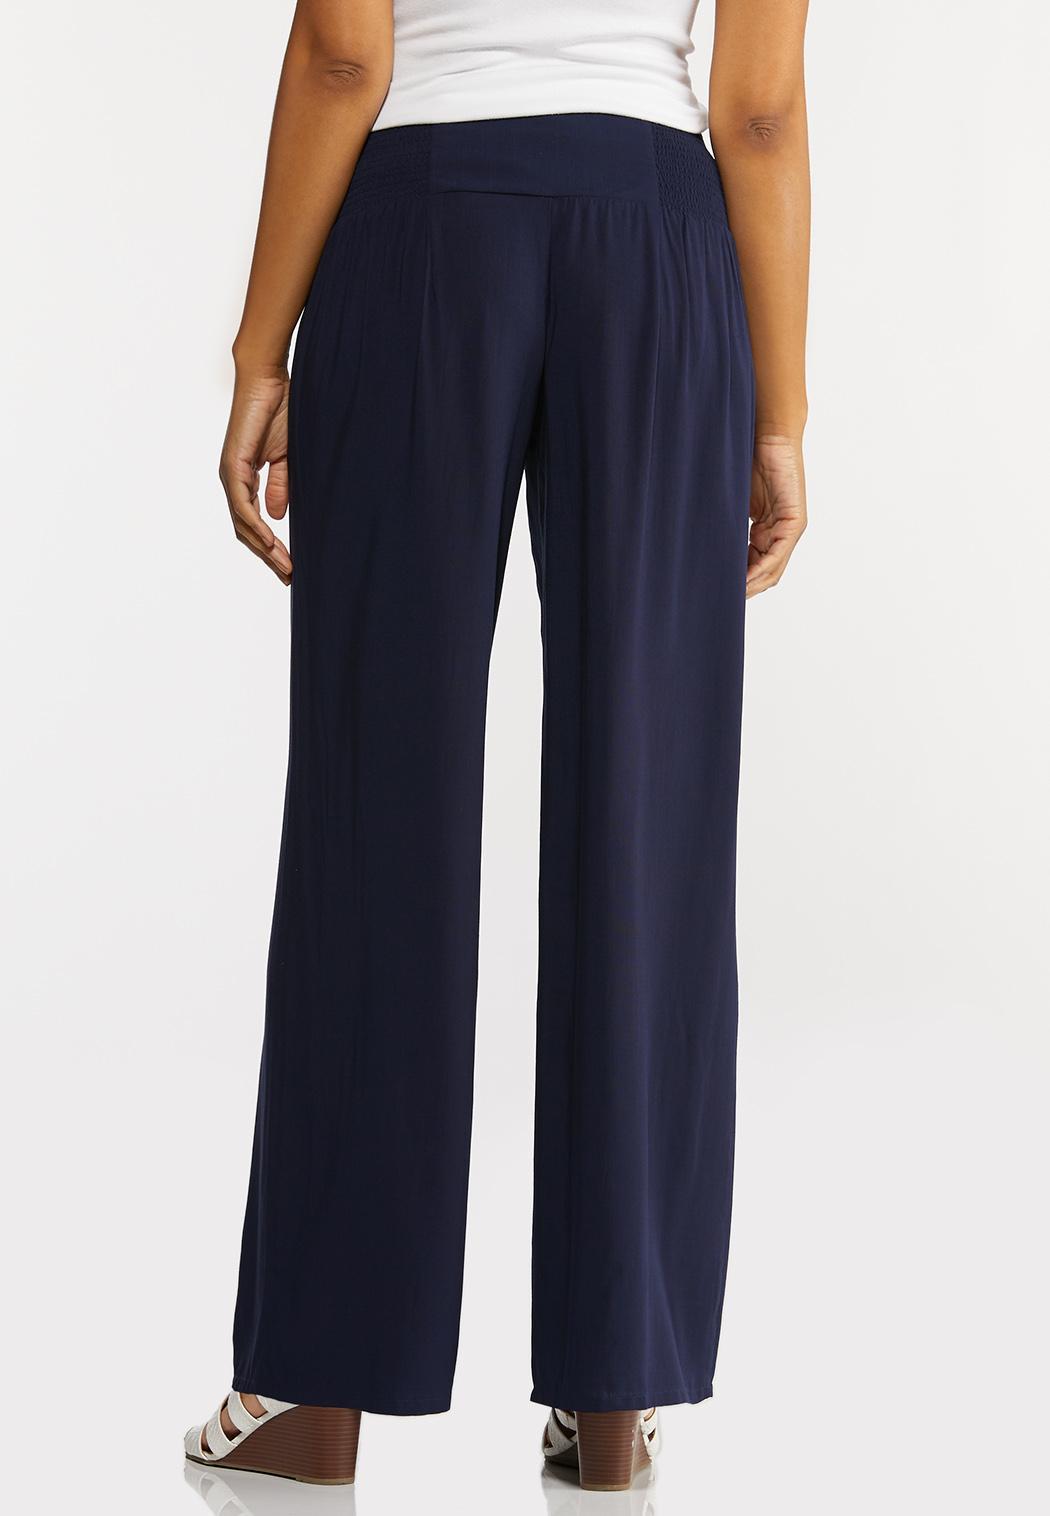 Petite Smocked Button Pants (Item #44289343)